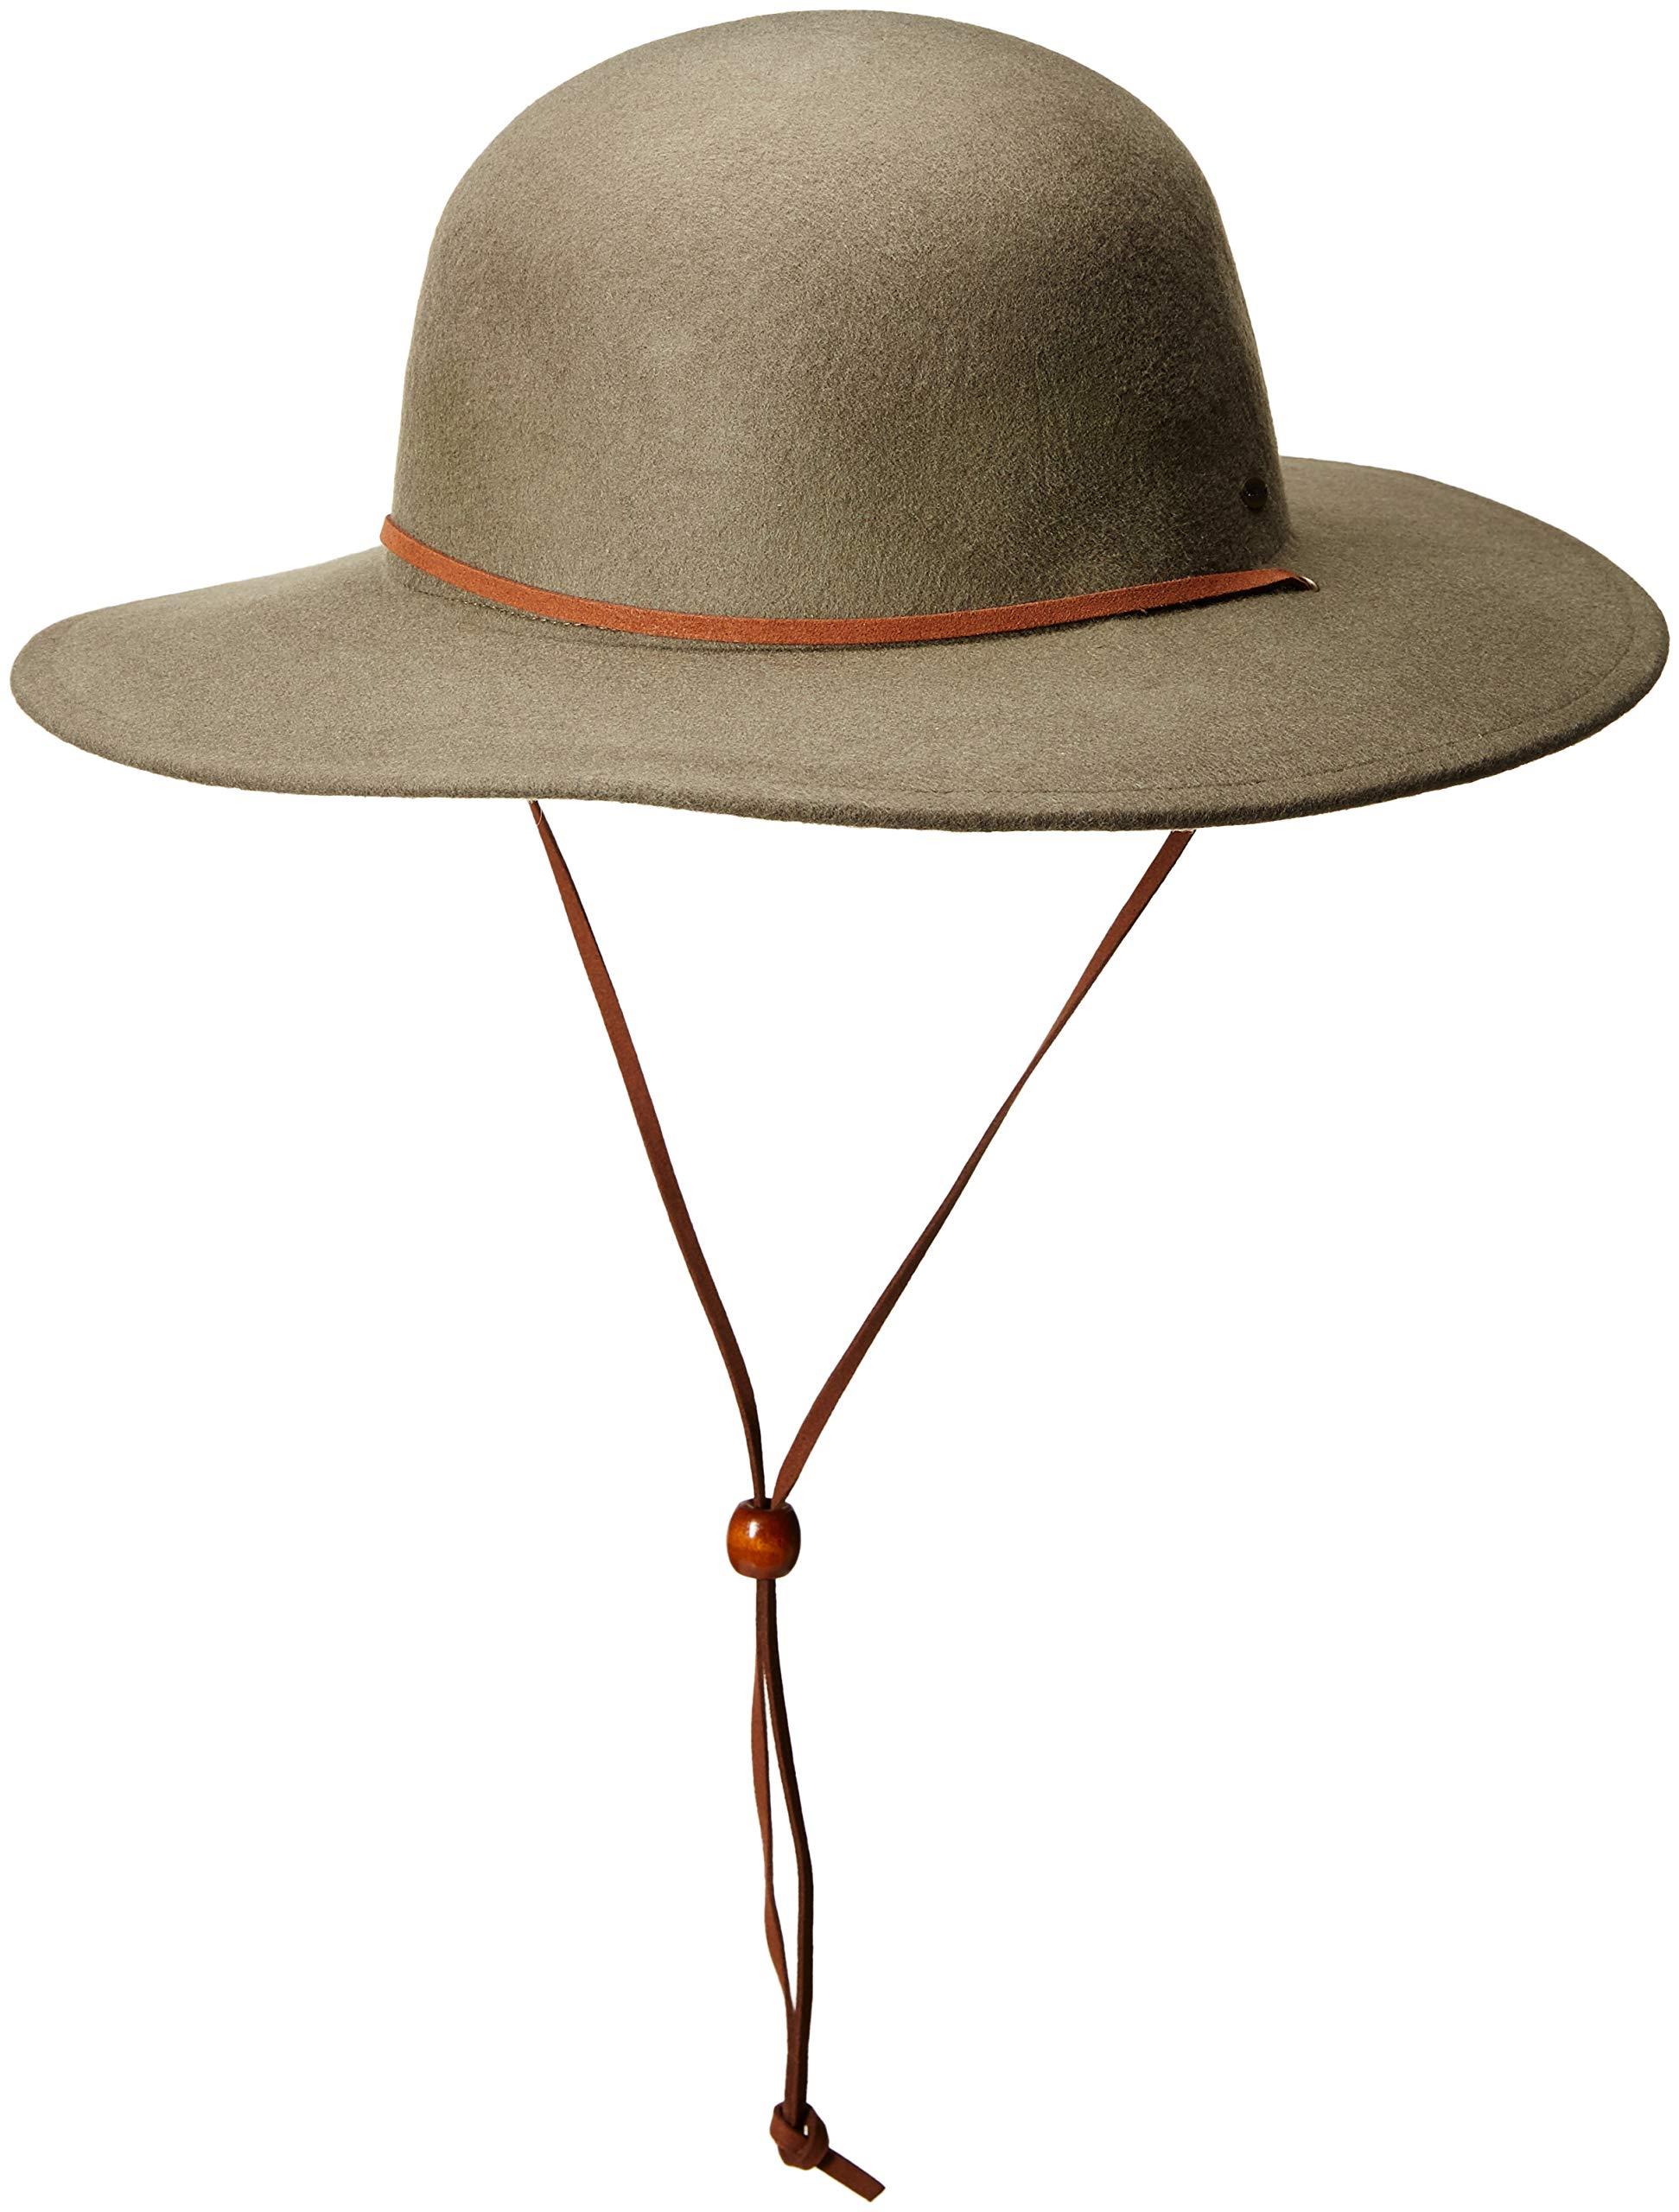 O'Neill Women's Trail Ride Felt Hat, Kangaroo, ONE